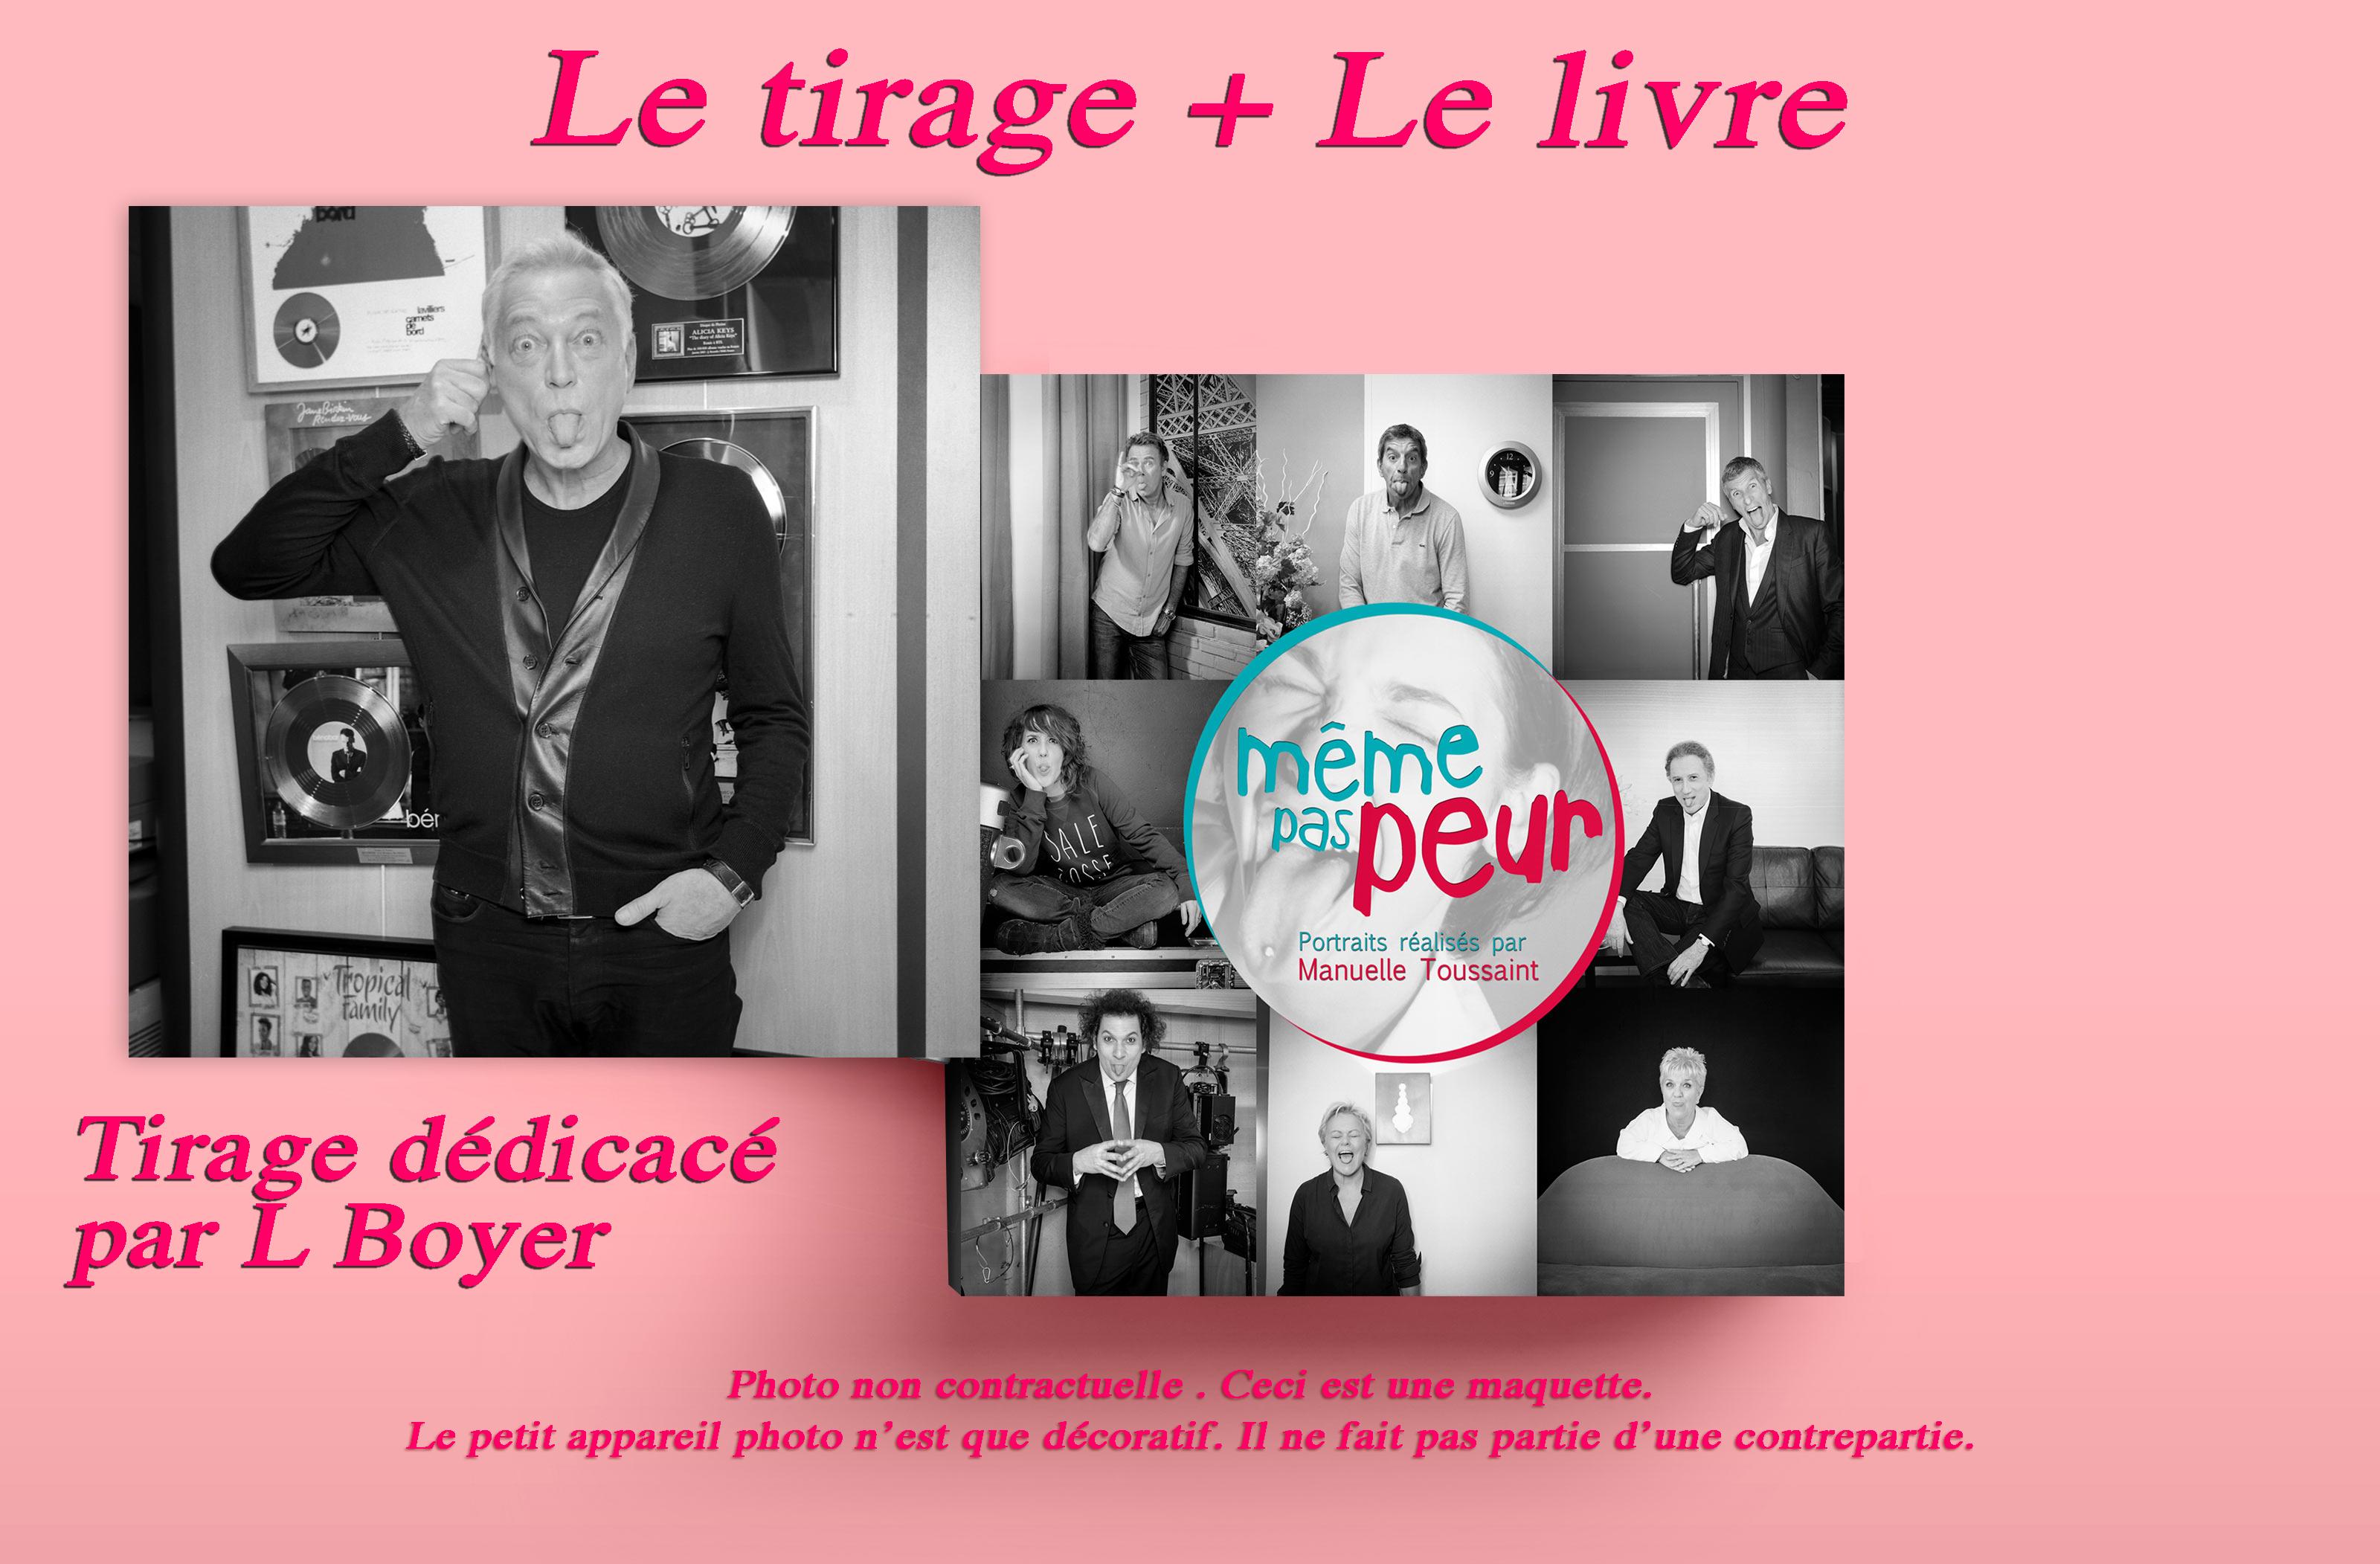 Tirage_dedicace_Boyer_livre-1497101489.jpg